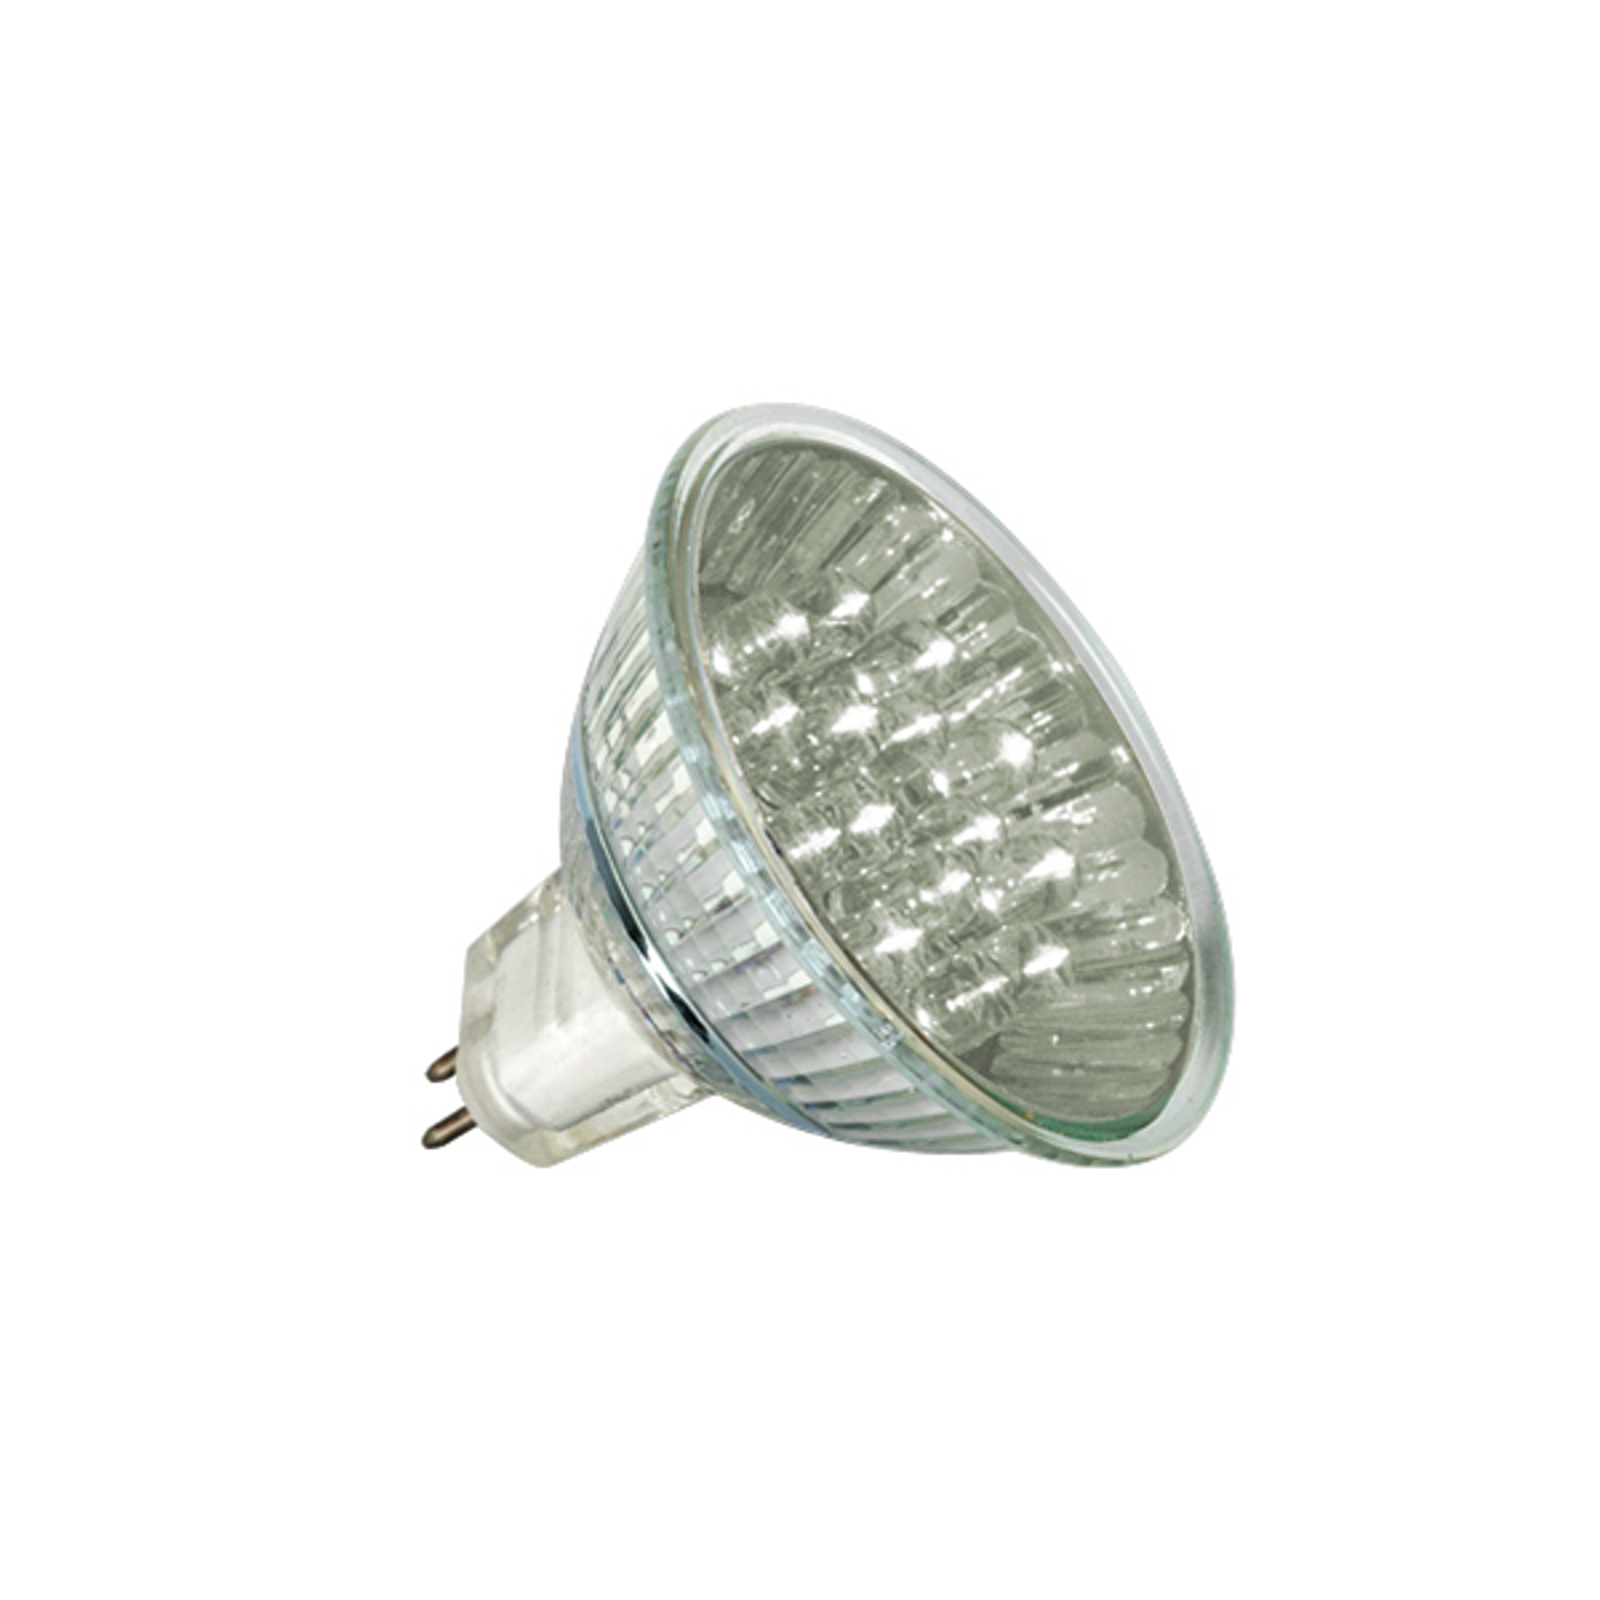 Dove acquistare GU5,3 MR16 1W LED lampadina a riflett. luce calda